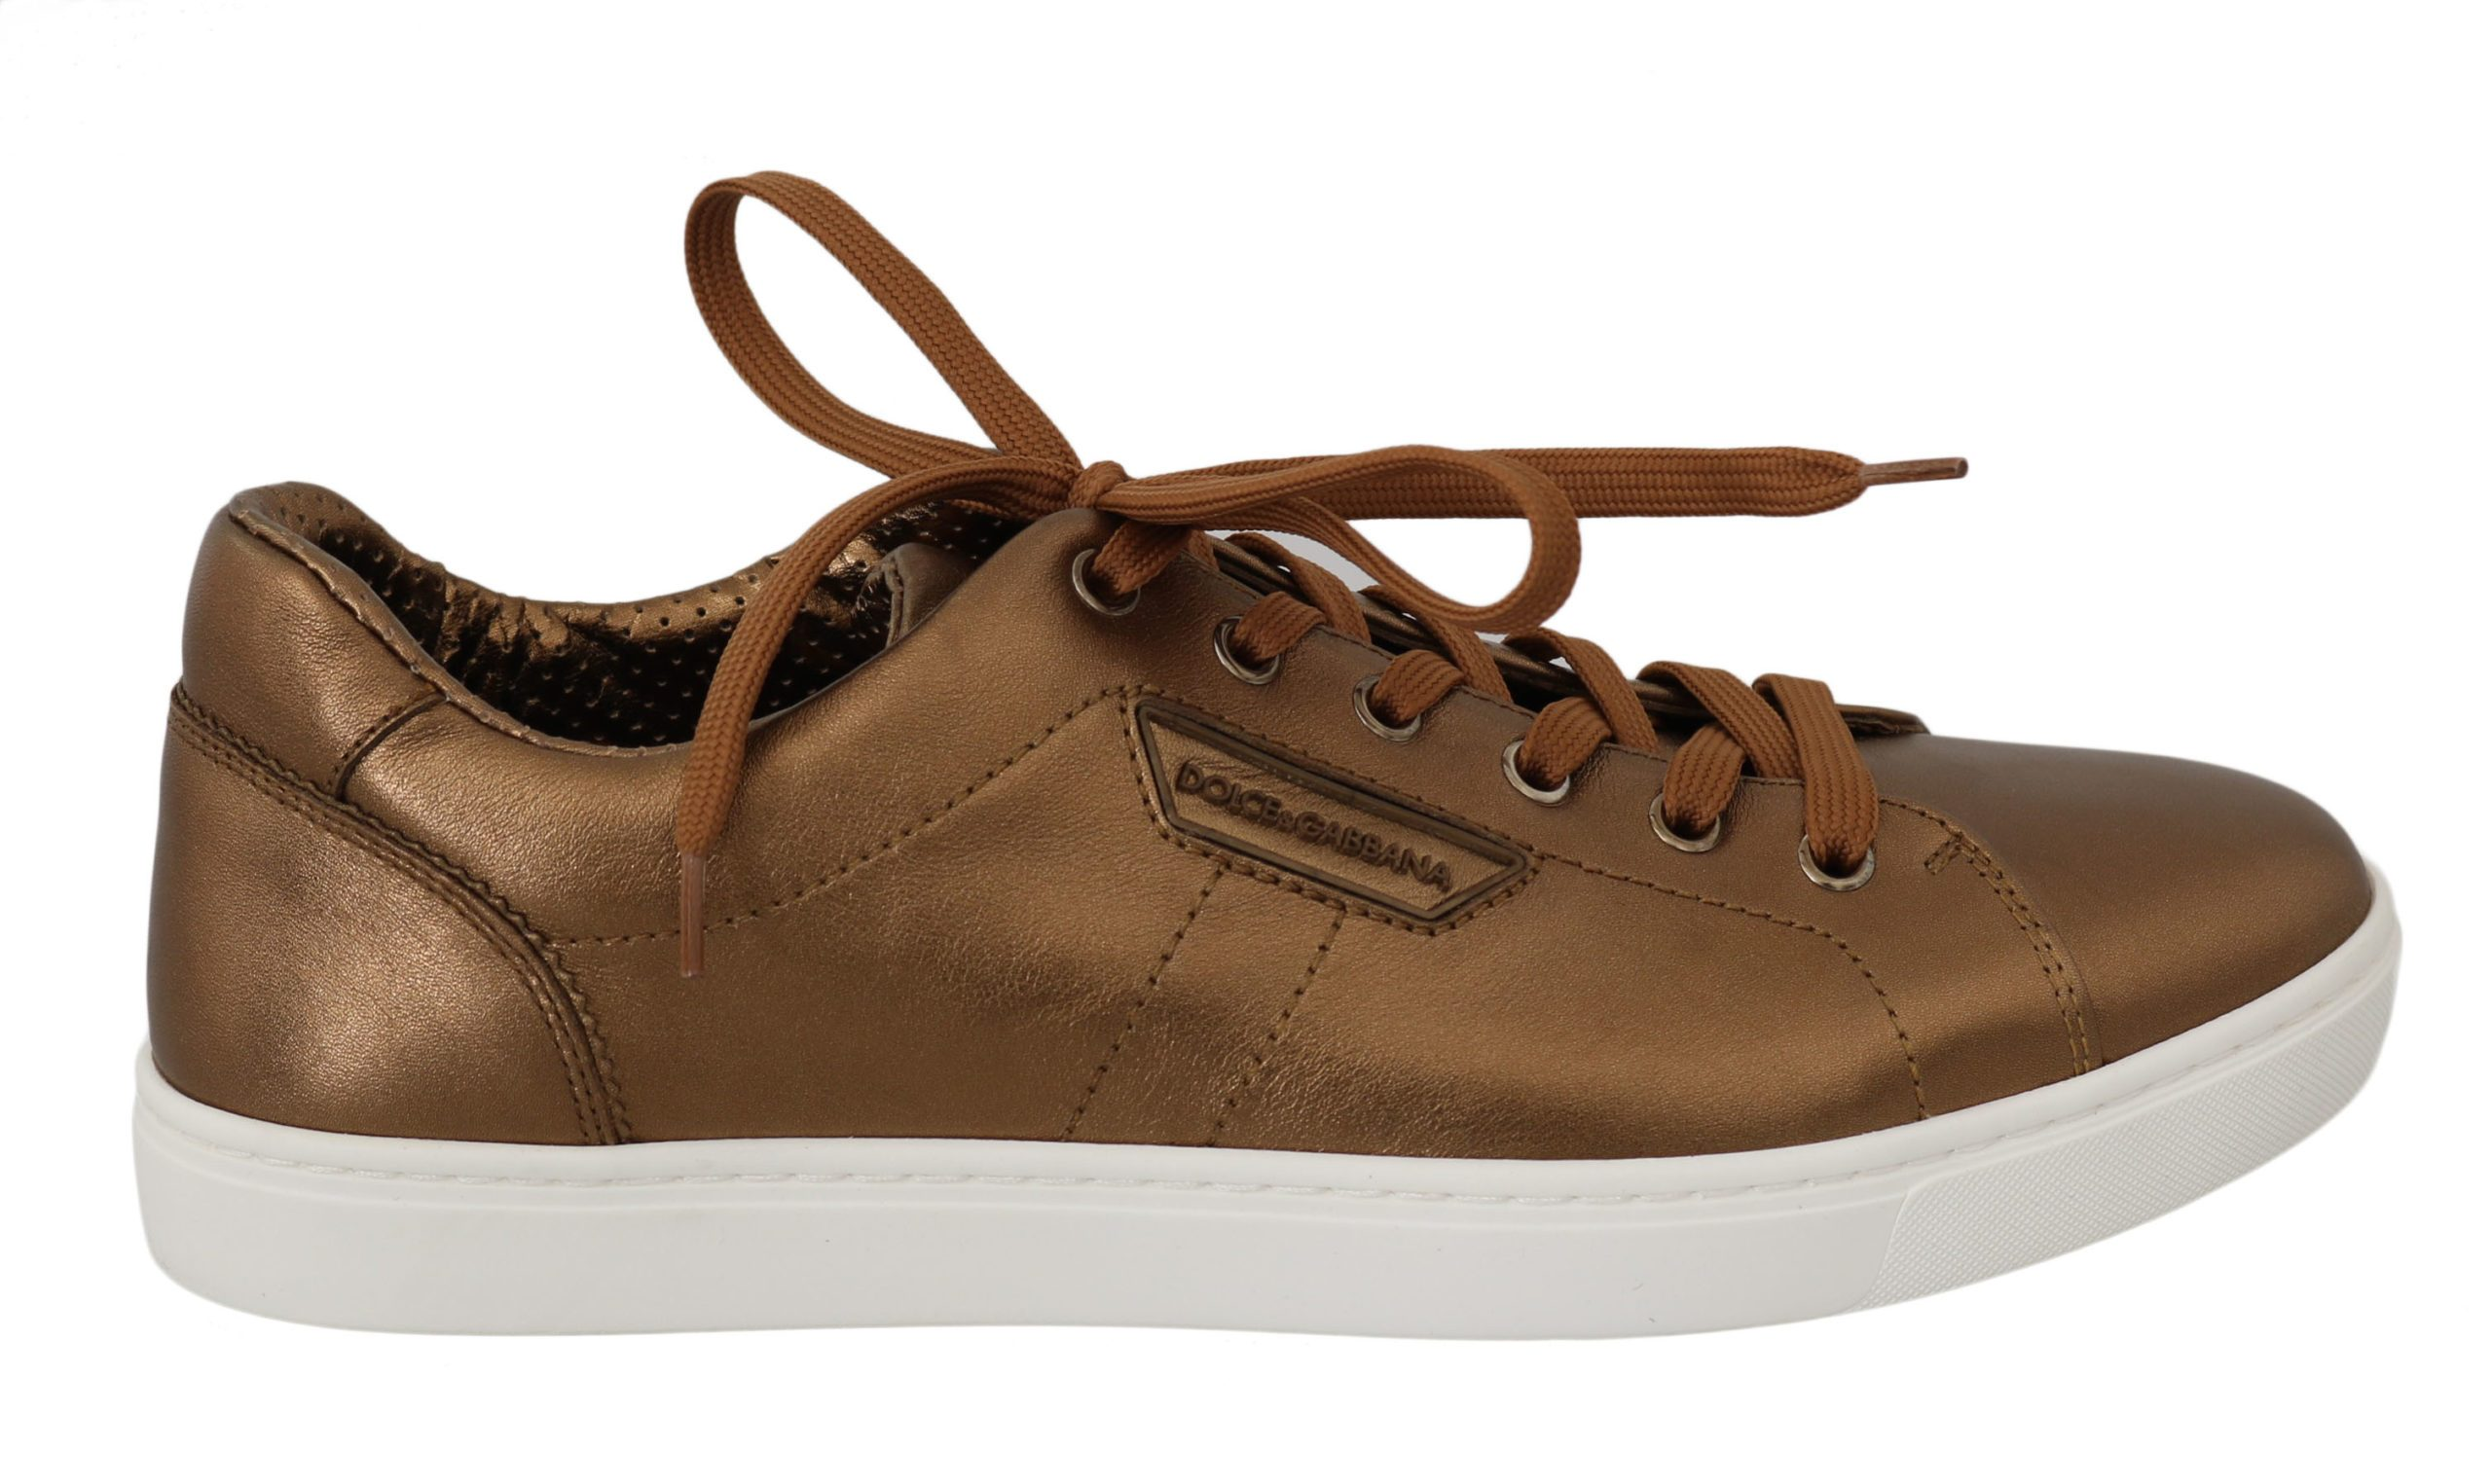 Dolce & Gabbana Men's Leather Casual Trainer Gold MV2363 - EU39/US6